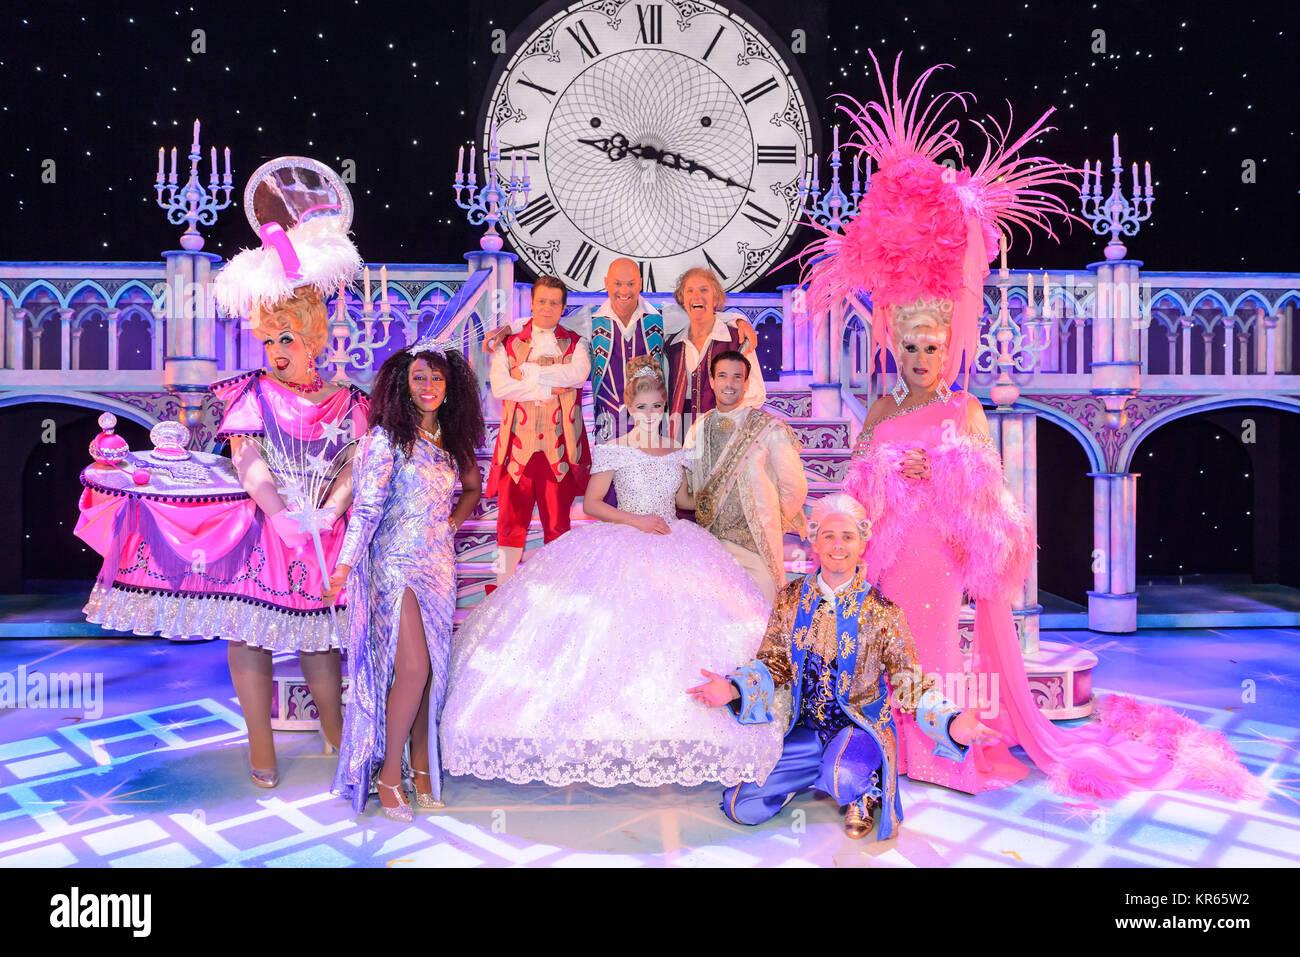 The Birmingham Hippodrome, Birmingham, UK. 18thDecember, 2017. Cinderella cast photocall.Pictured are Cinderella Stock Photo